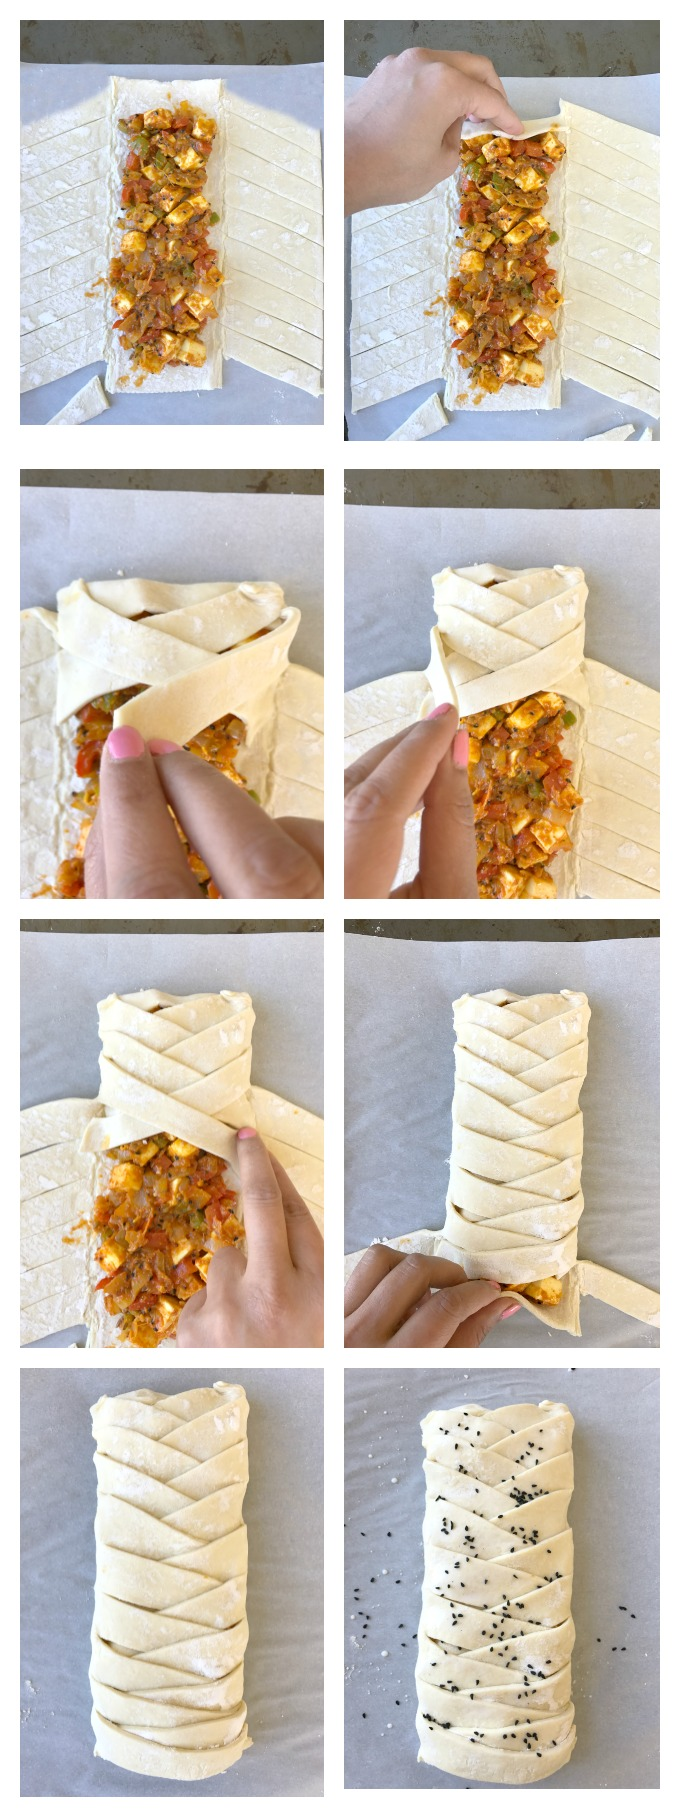 achari-puff-pastry-making-assembly